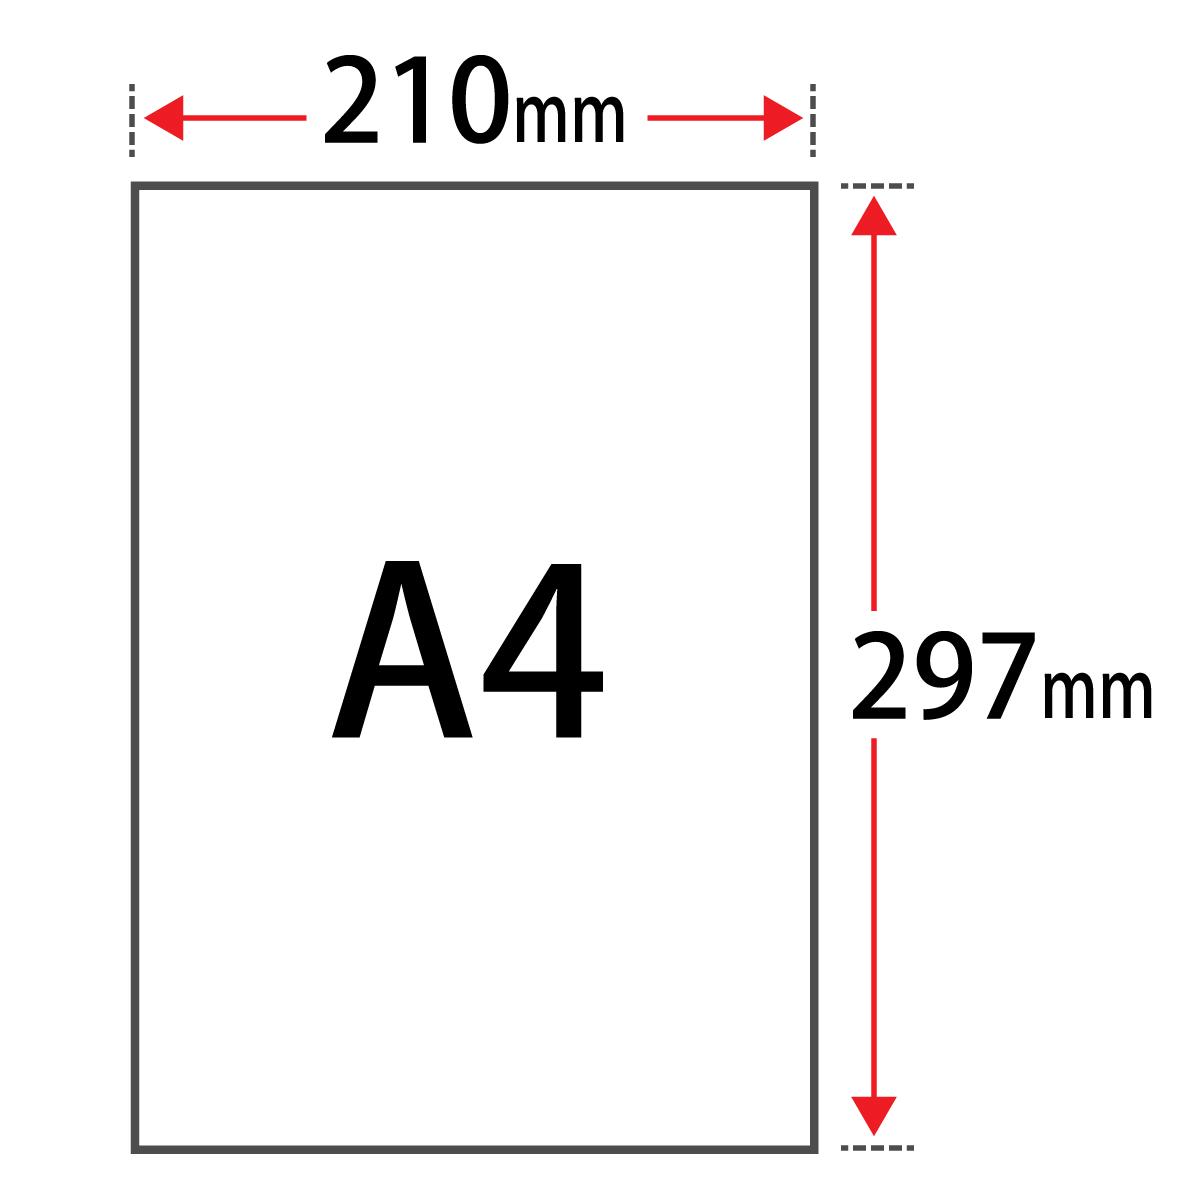 MS上質紙 104 7g 平米 A4サイズ 2000枚つや消し上質紙 インクジェット プリンター ミシン目加工可能 大判 印hQdtsBorCx